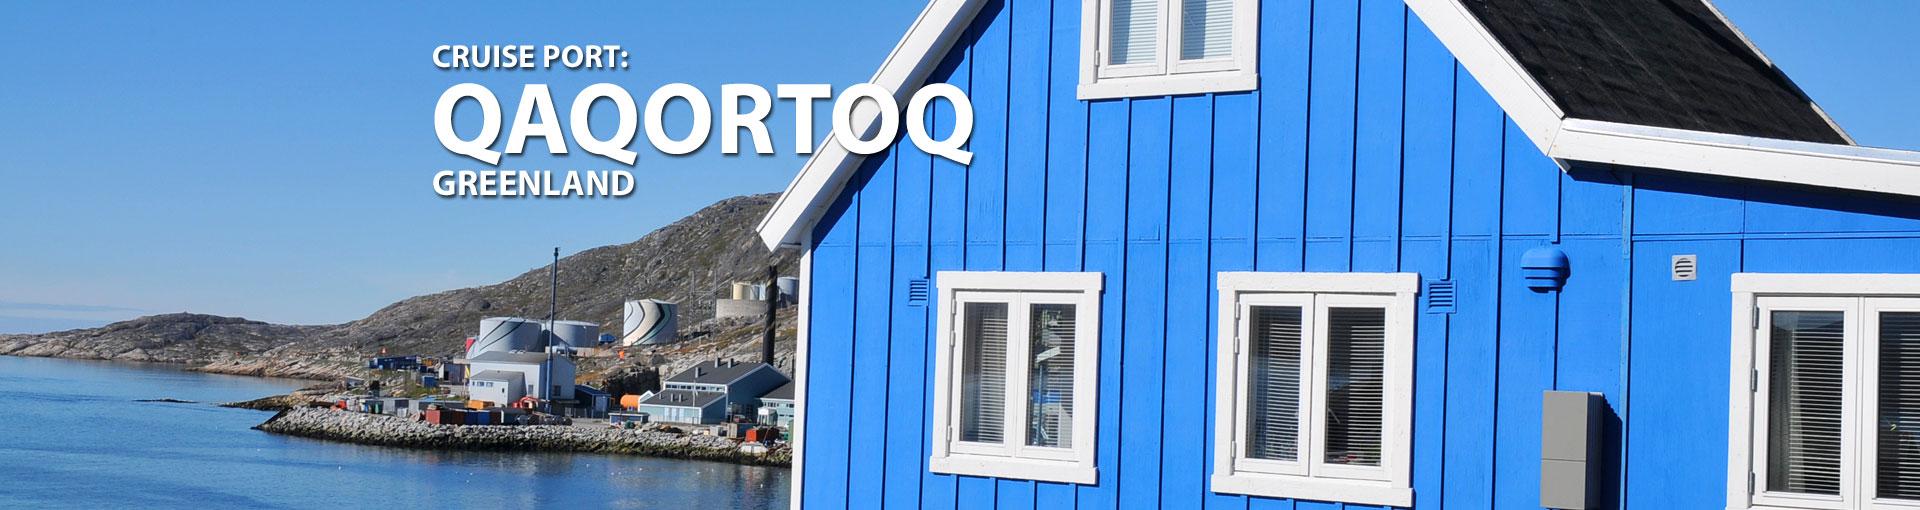 Cruises to Qaqortoq, Greenland